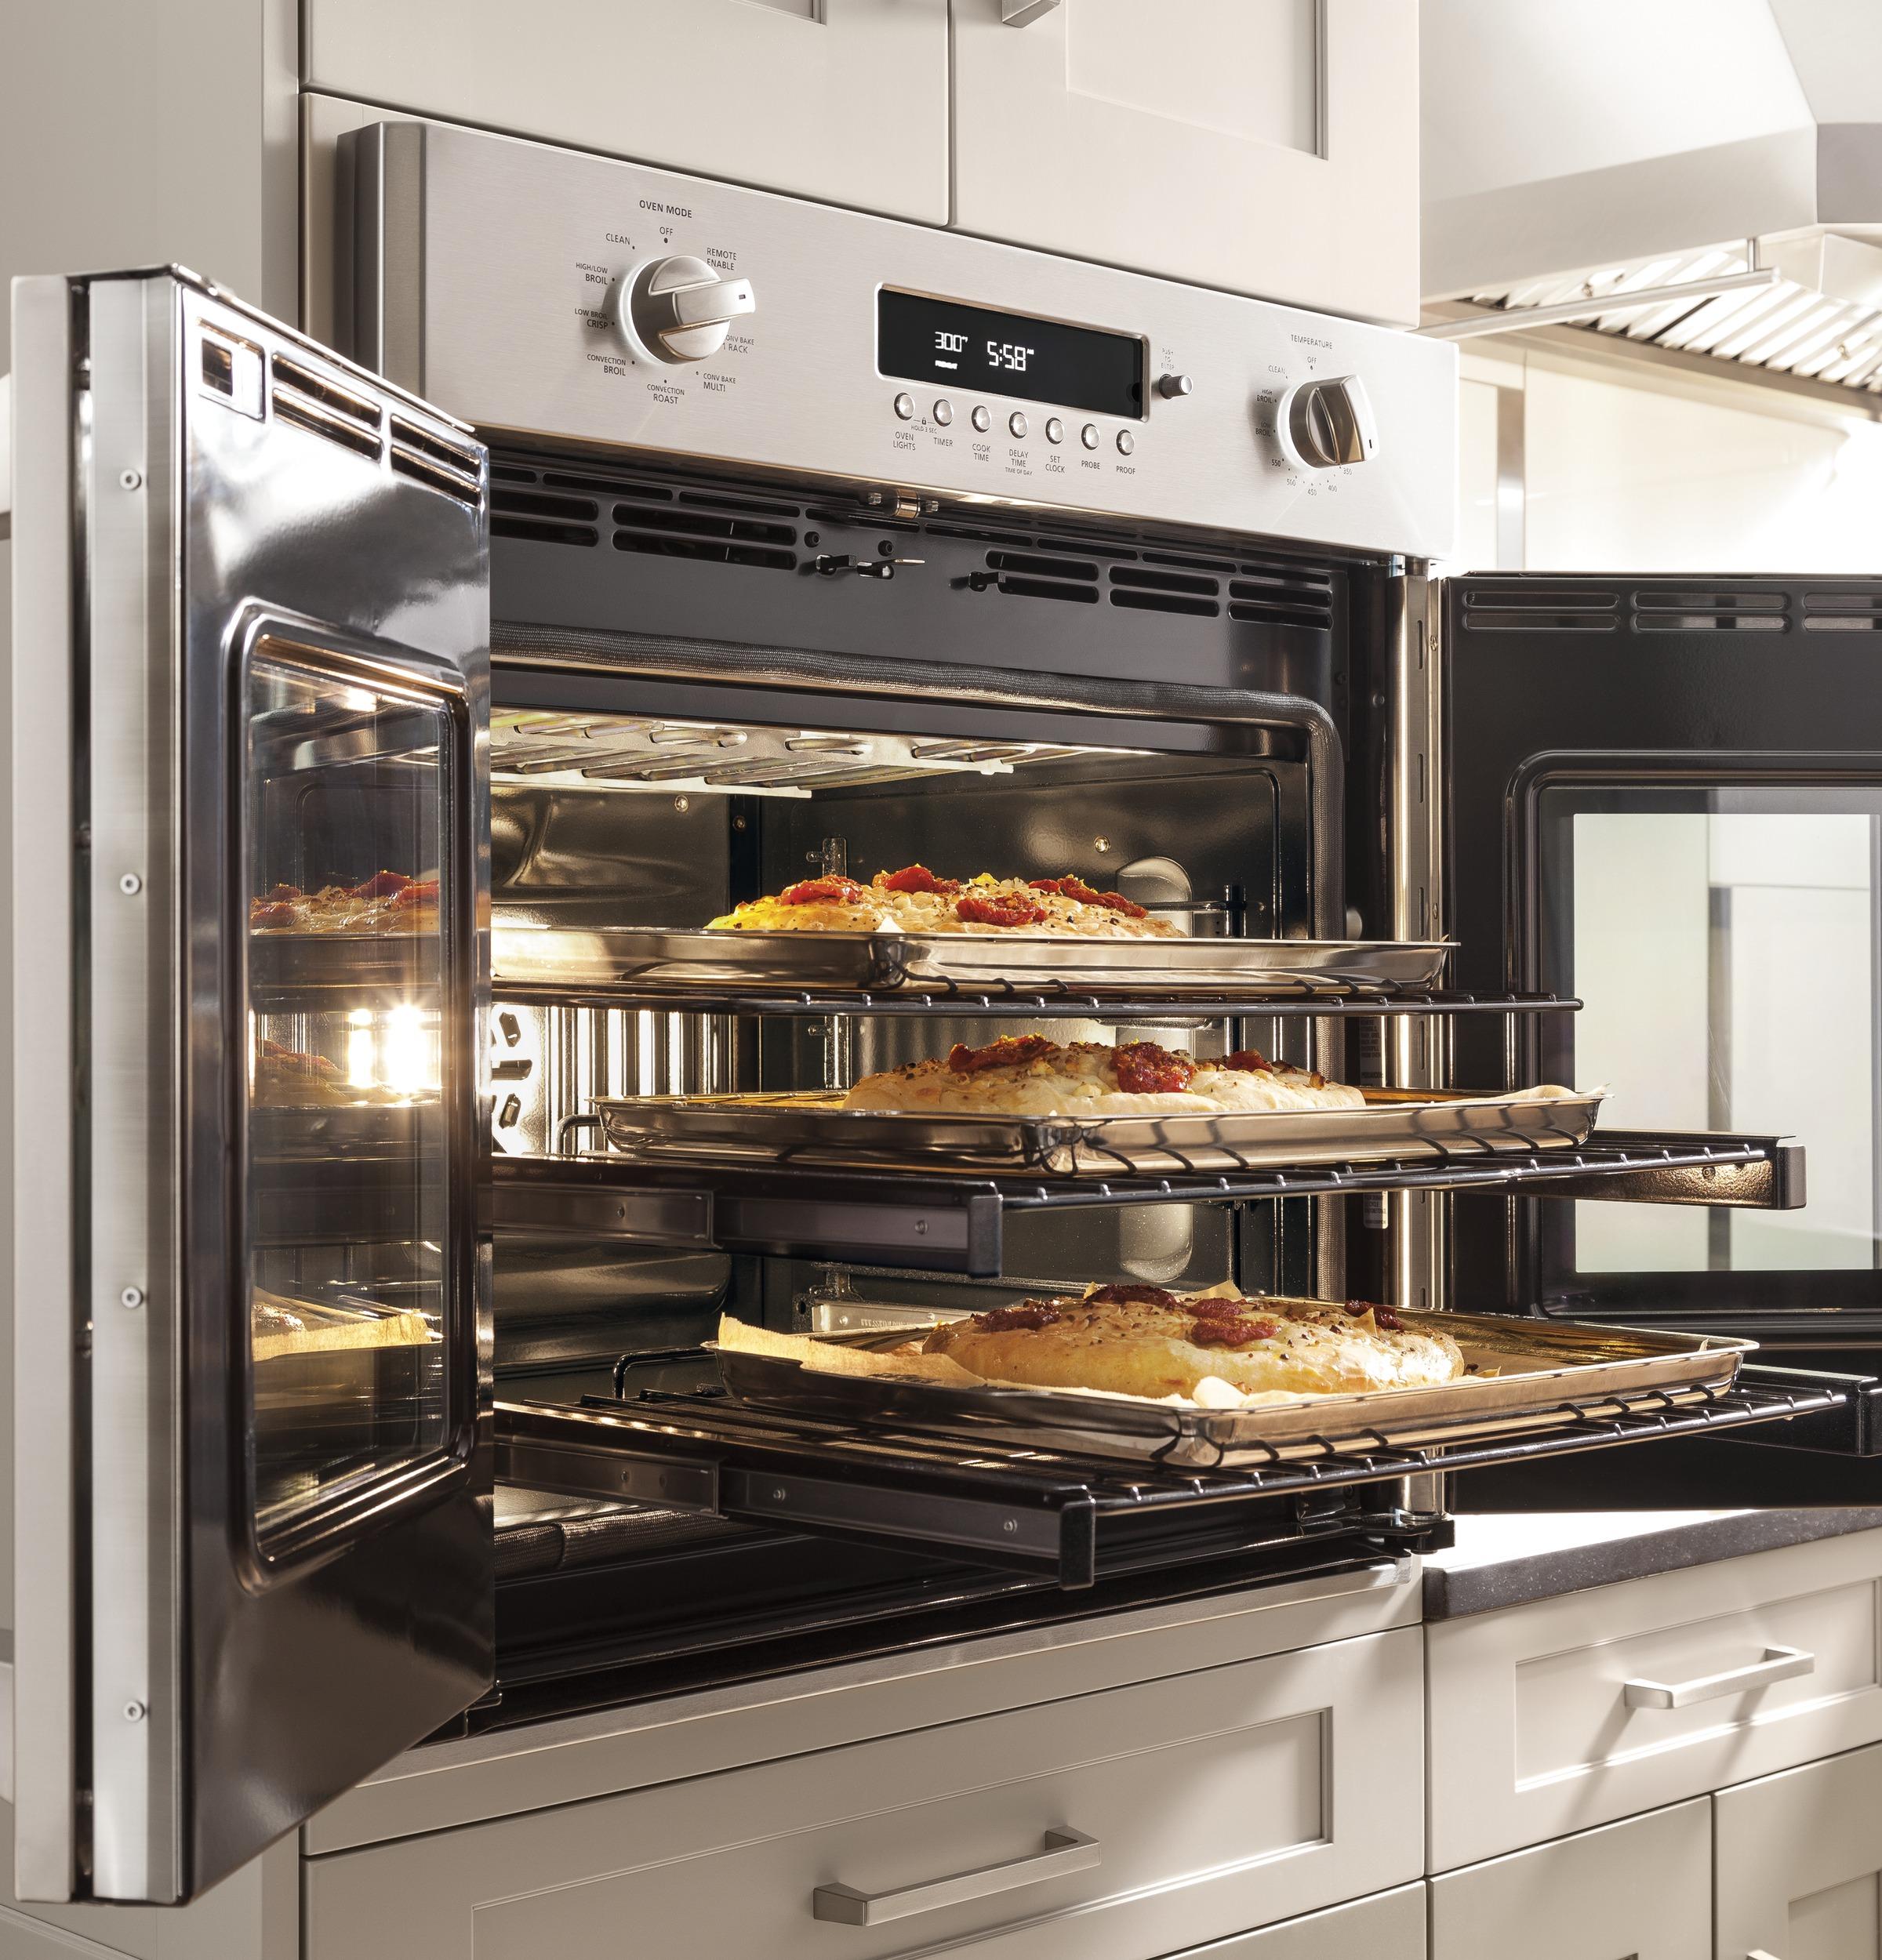 "Model: ZET1FHSS | Monogram Monogram 30"" Professional French-Door Electronic Convection Single Wall Oven"